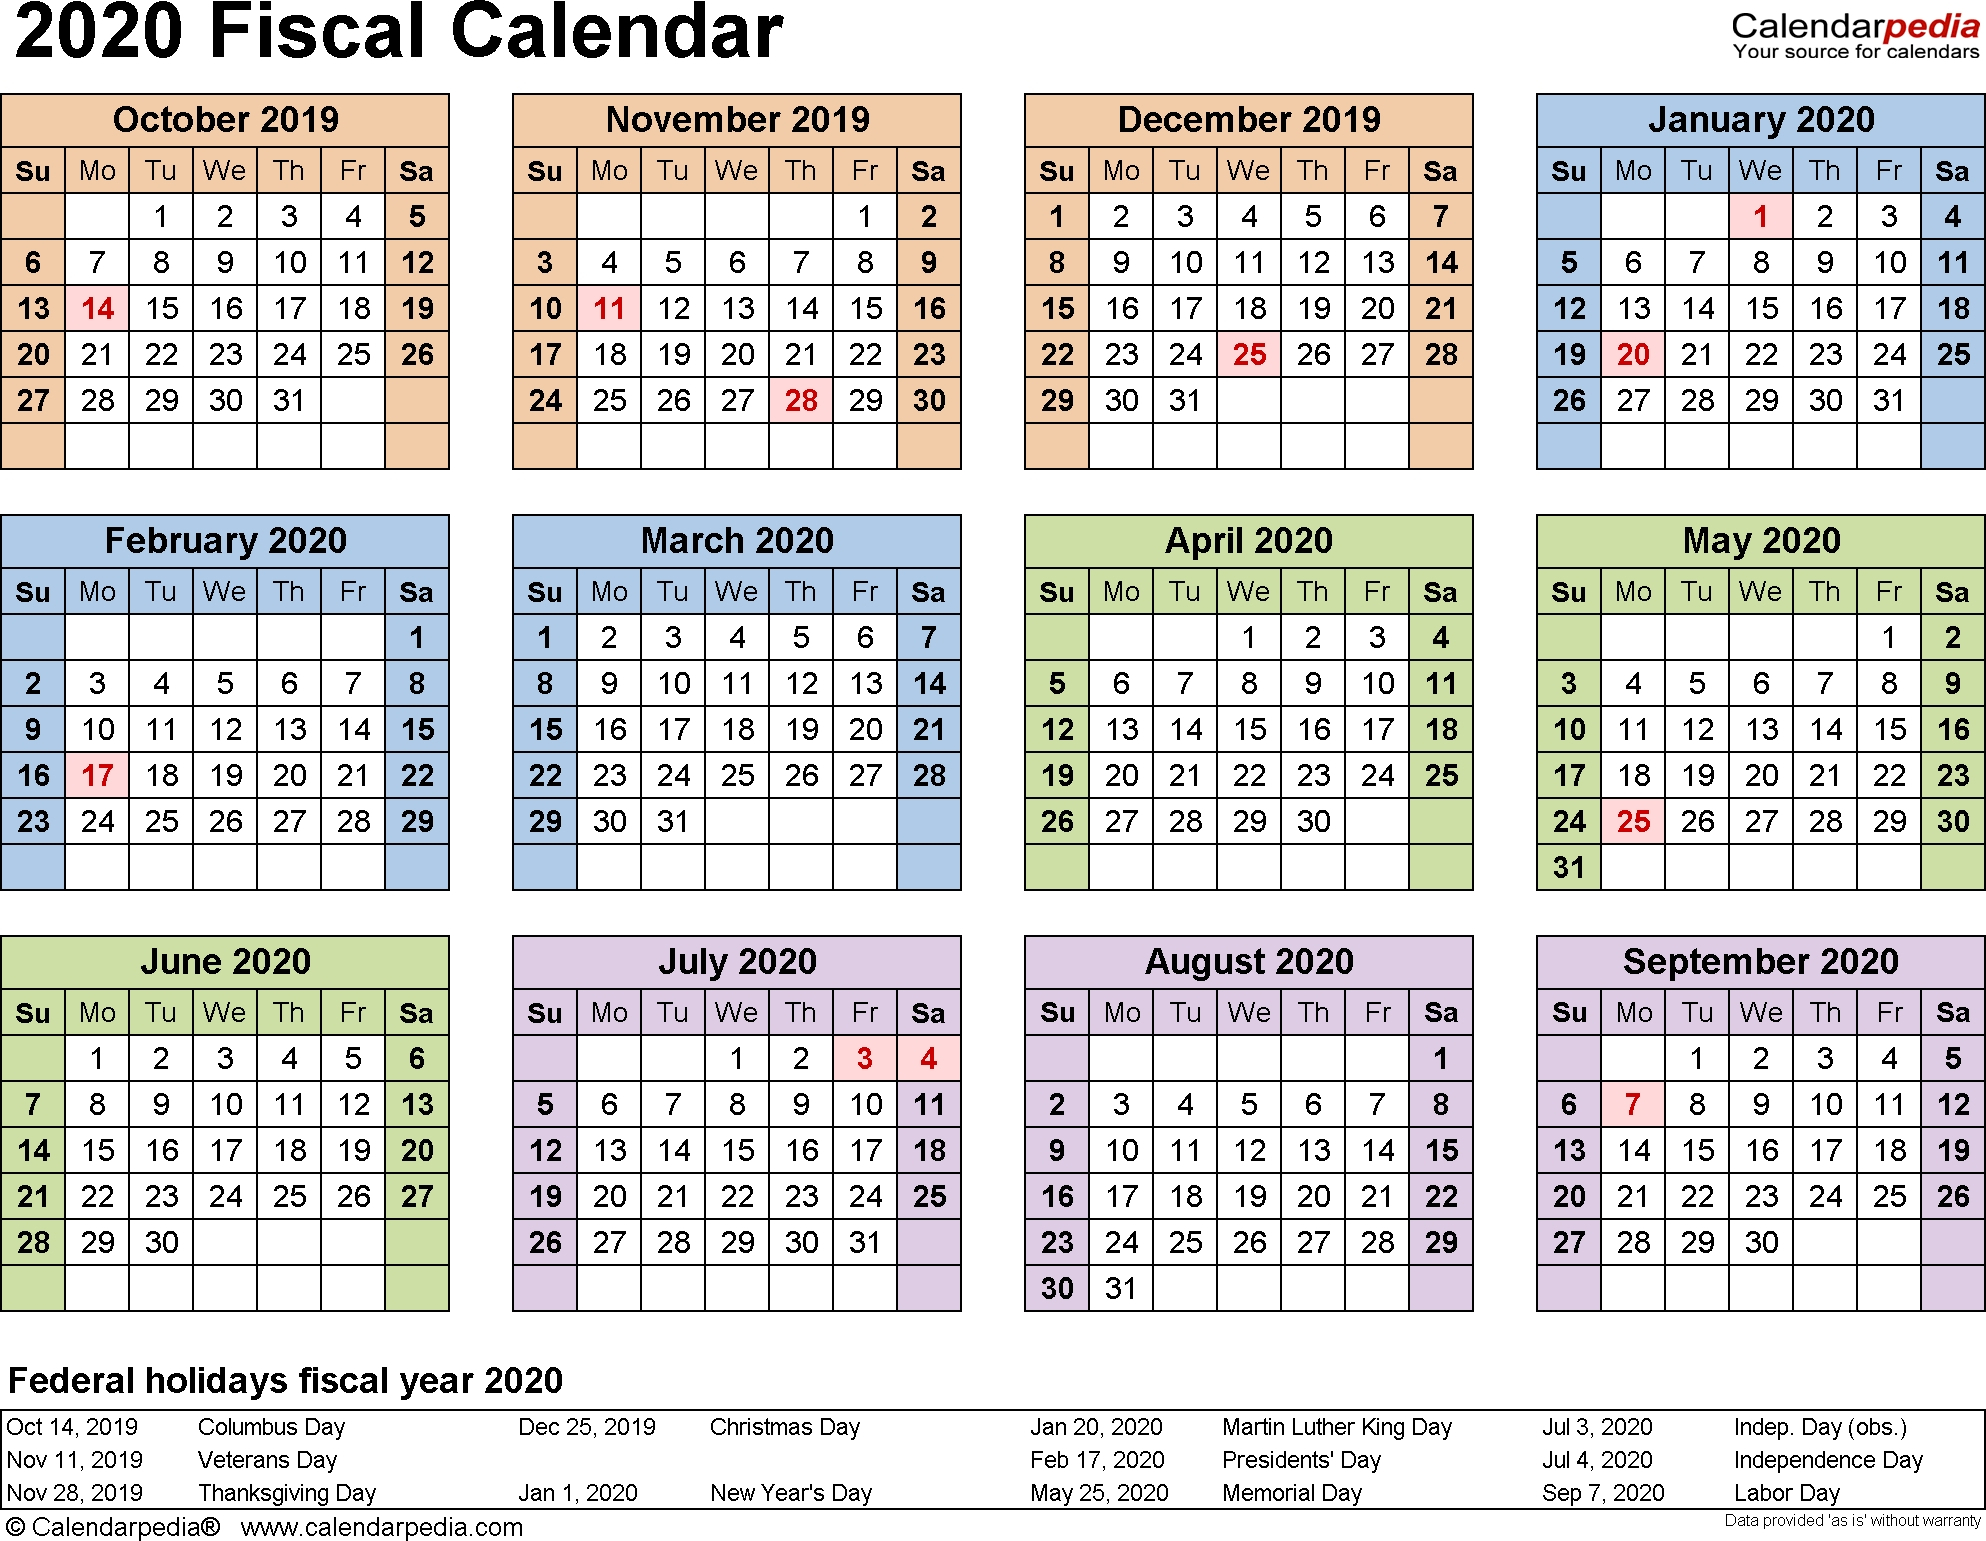 Retail Calander 2020 - Calendar Inspiration Design pertaining to Hmrc Tax Weekly Calander 2019-2020